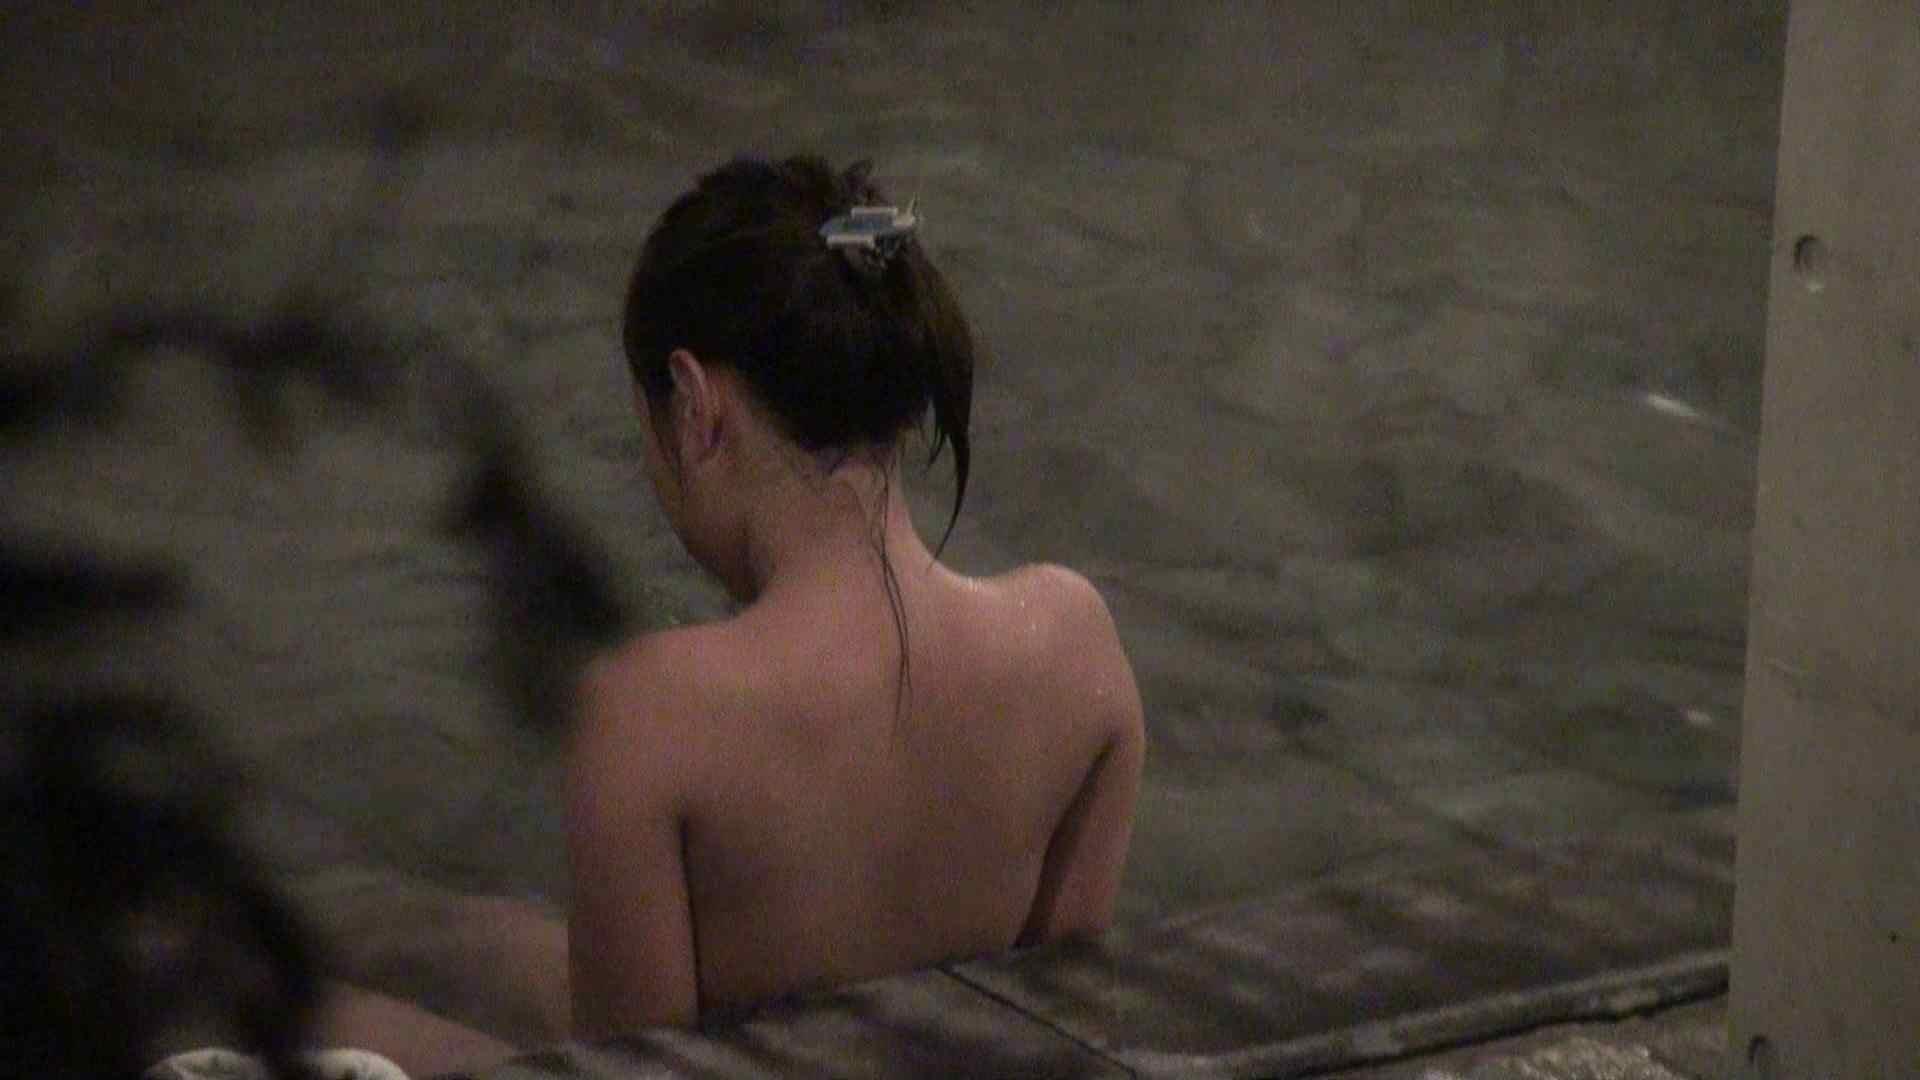 Aquaな露天風呂Vol.407 盗撮 ぱこり動画紹介 107画像 107